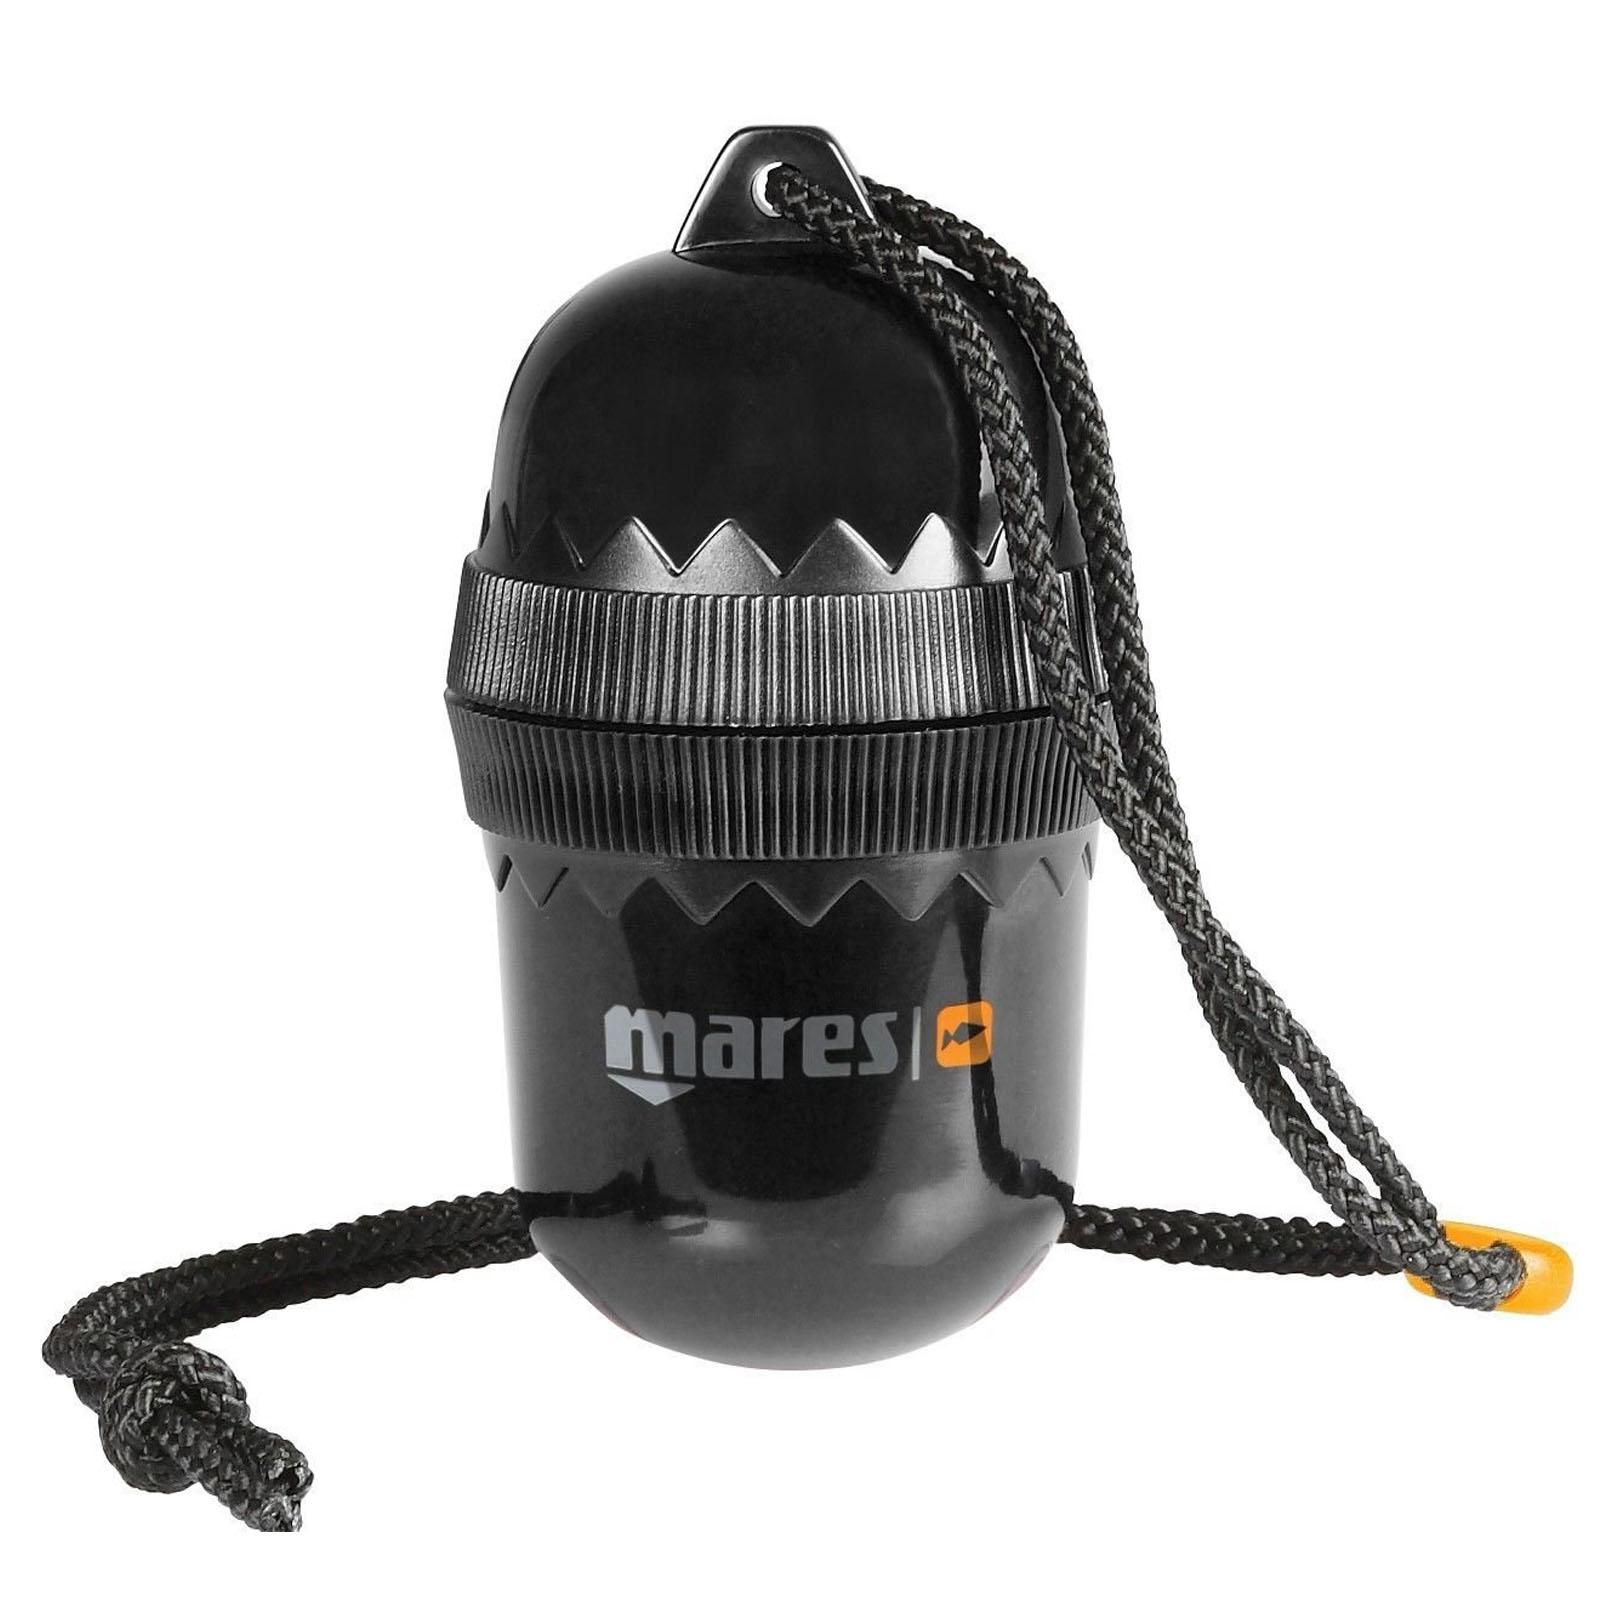 Mares Shaker mit Magnet Signalgeber